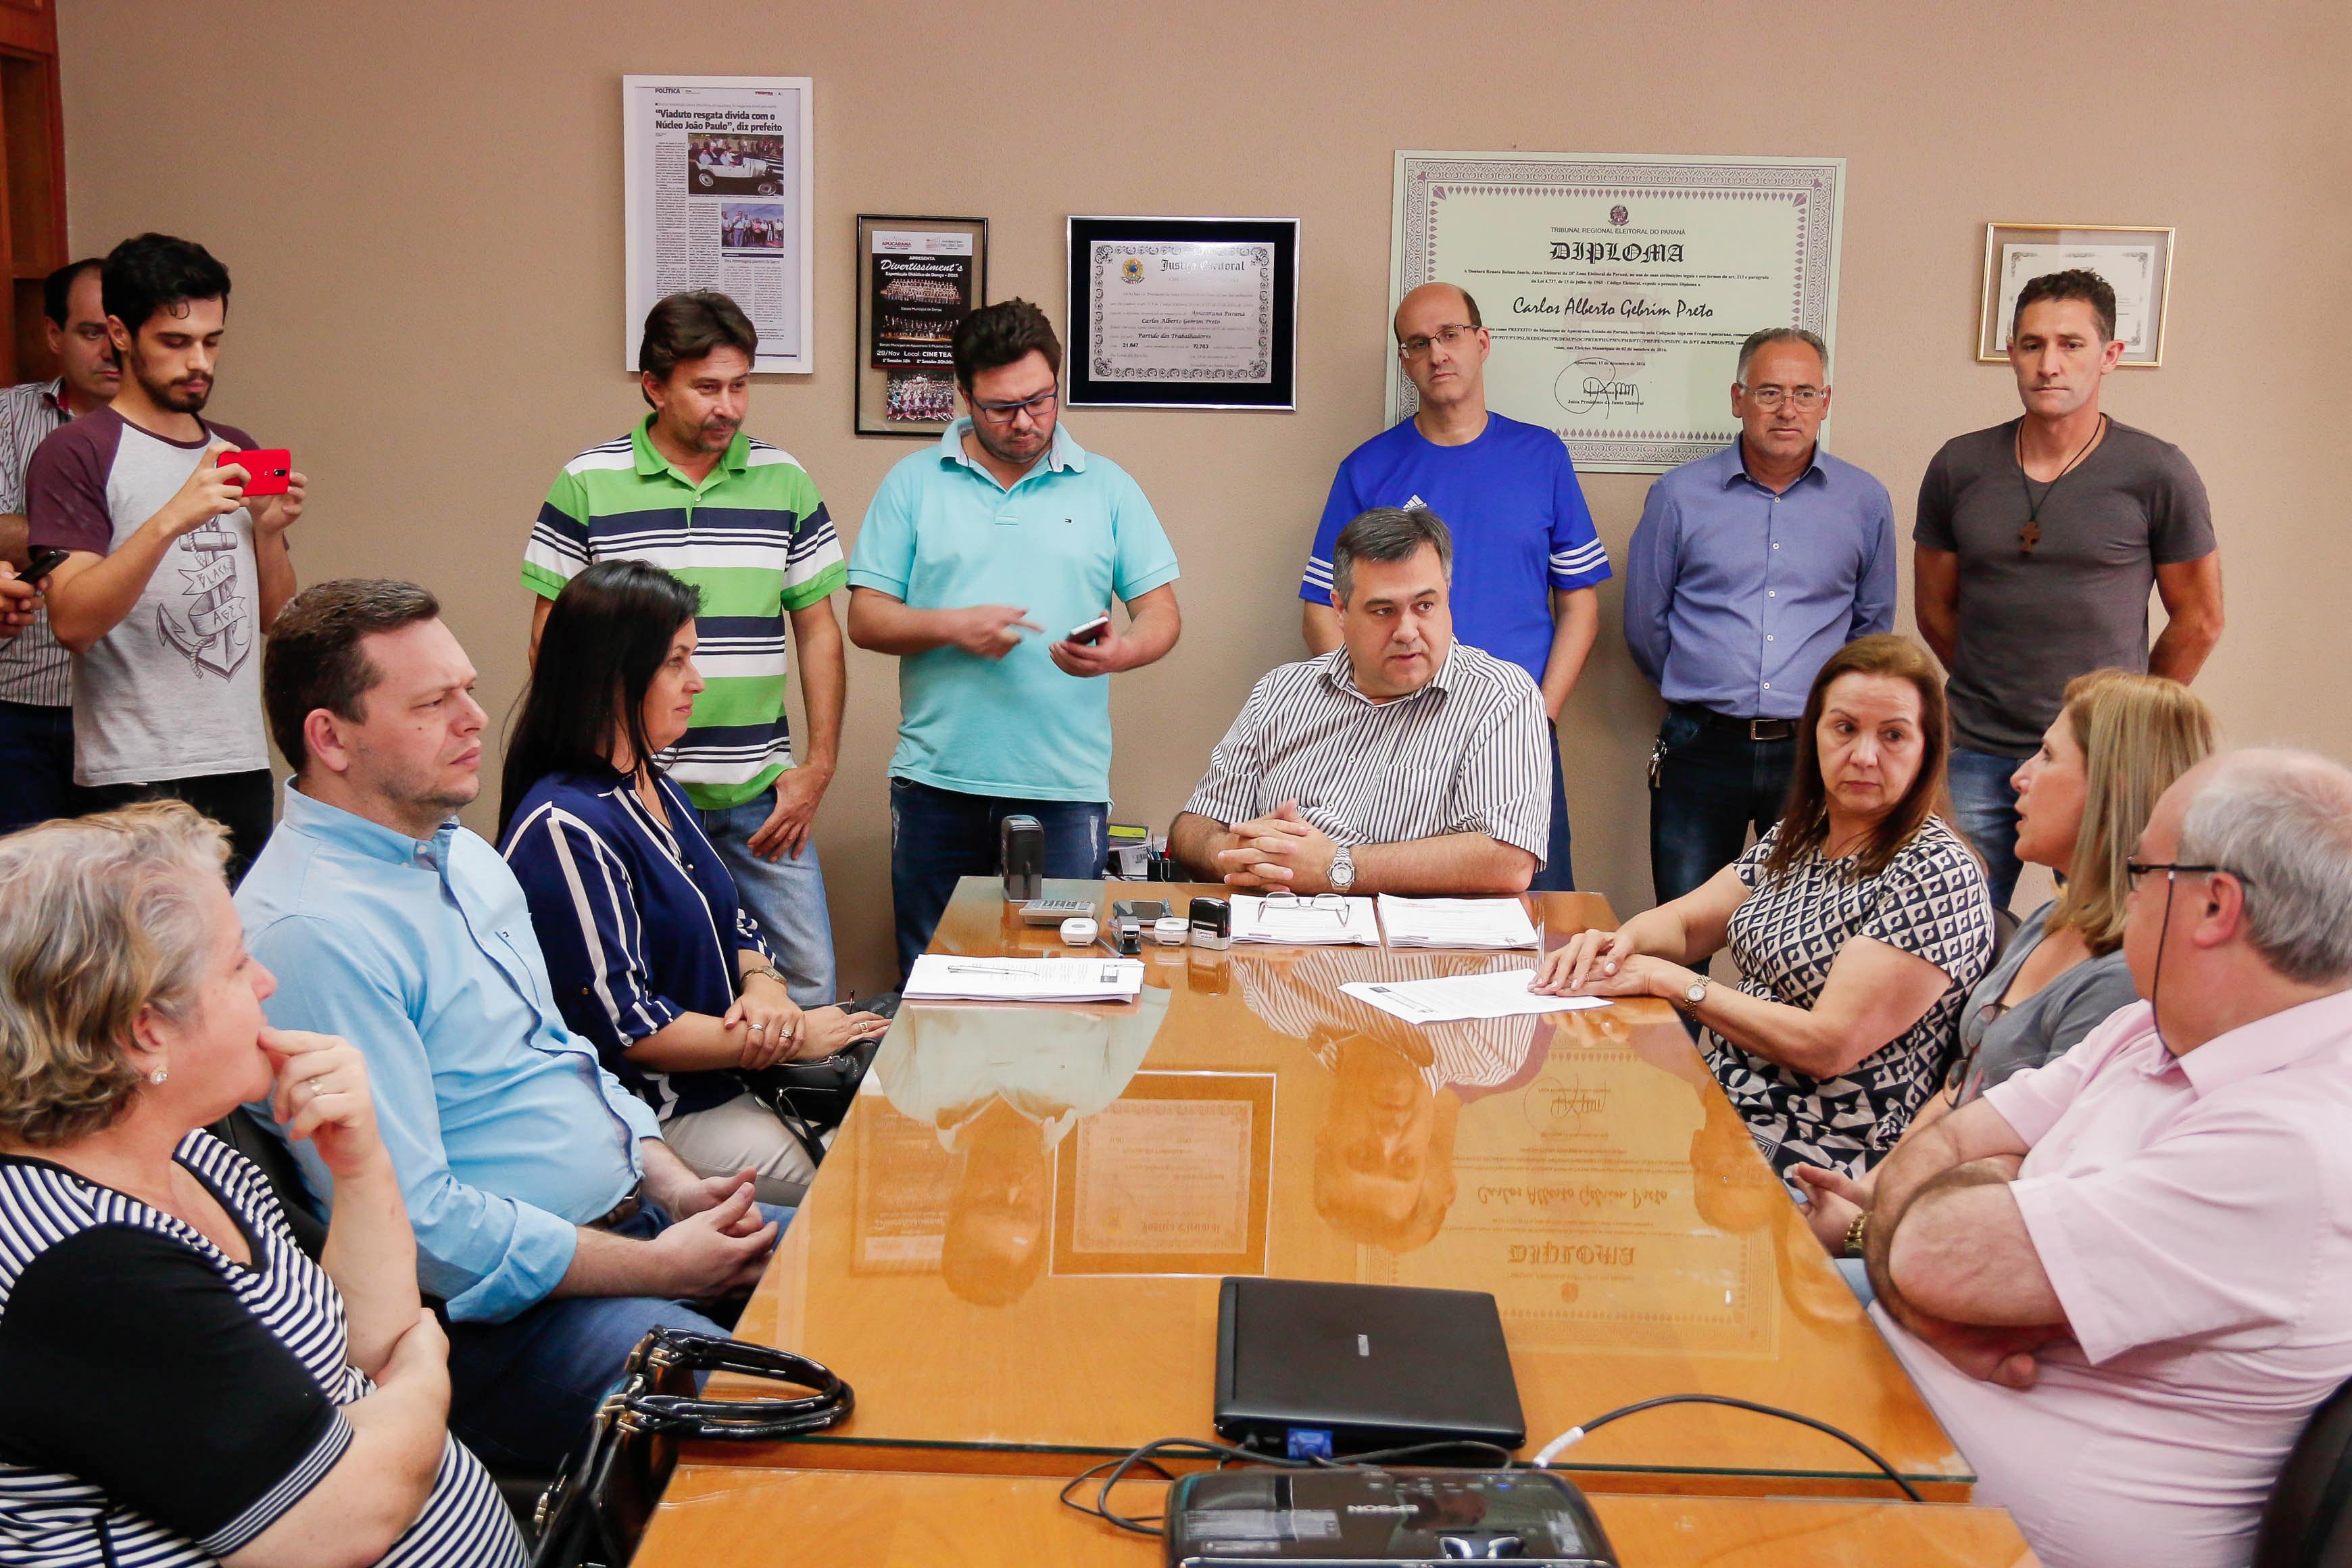 Prefeitura investe R$ 1,4 mi na reforma de unidades de ensino